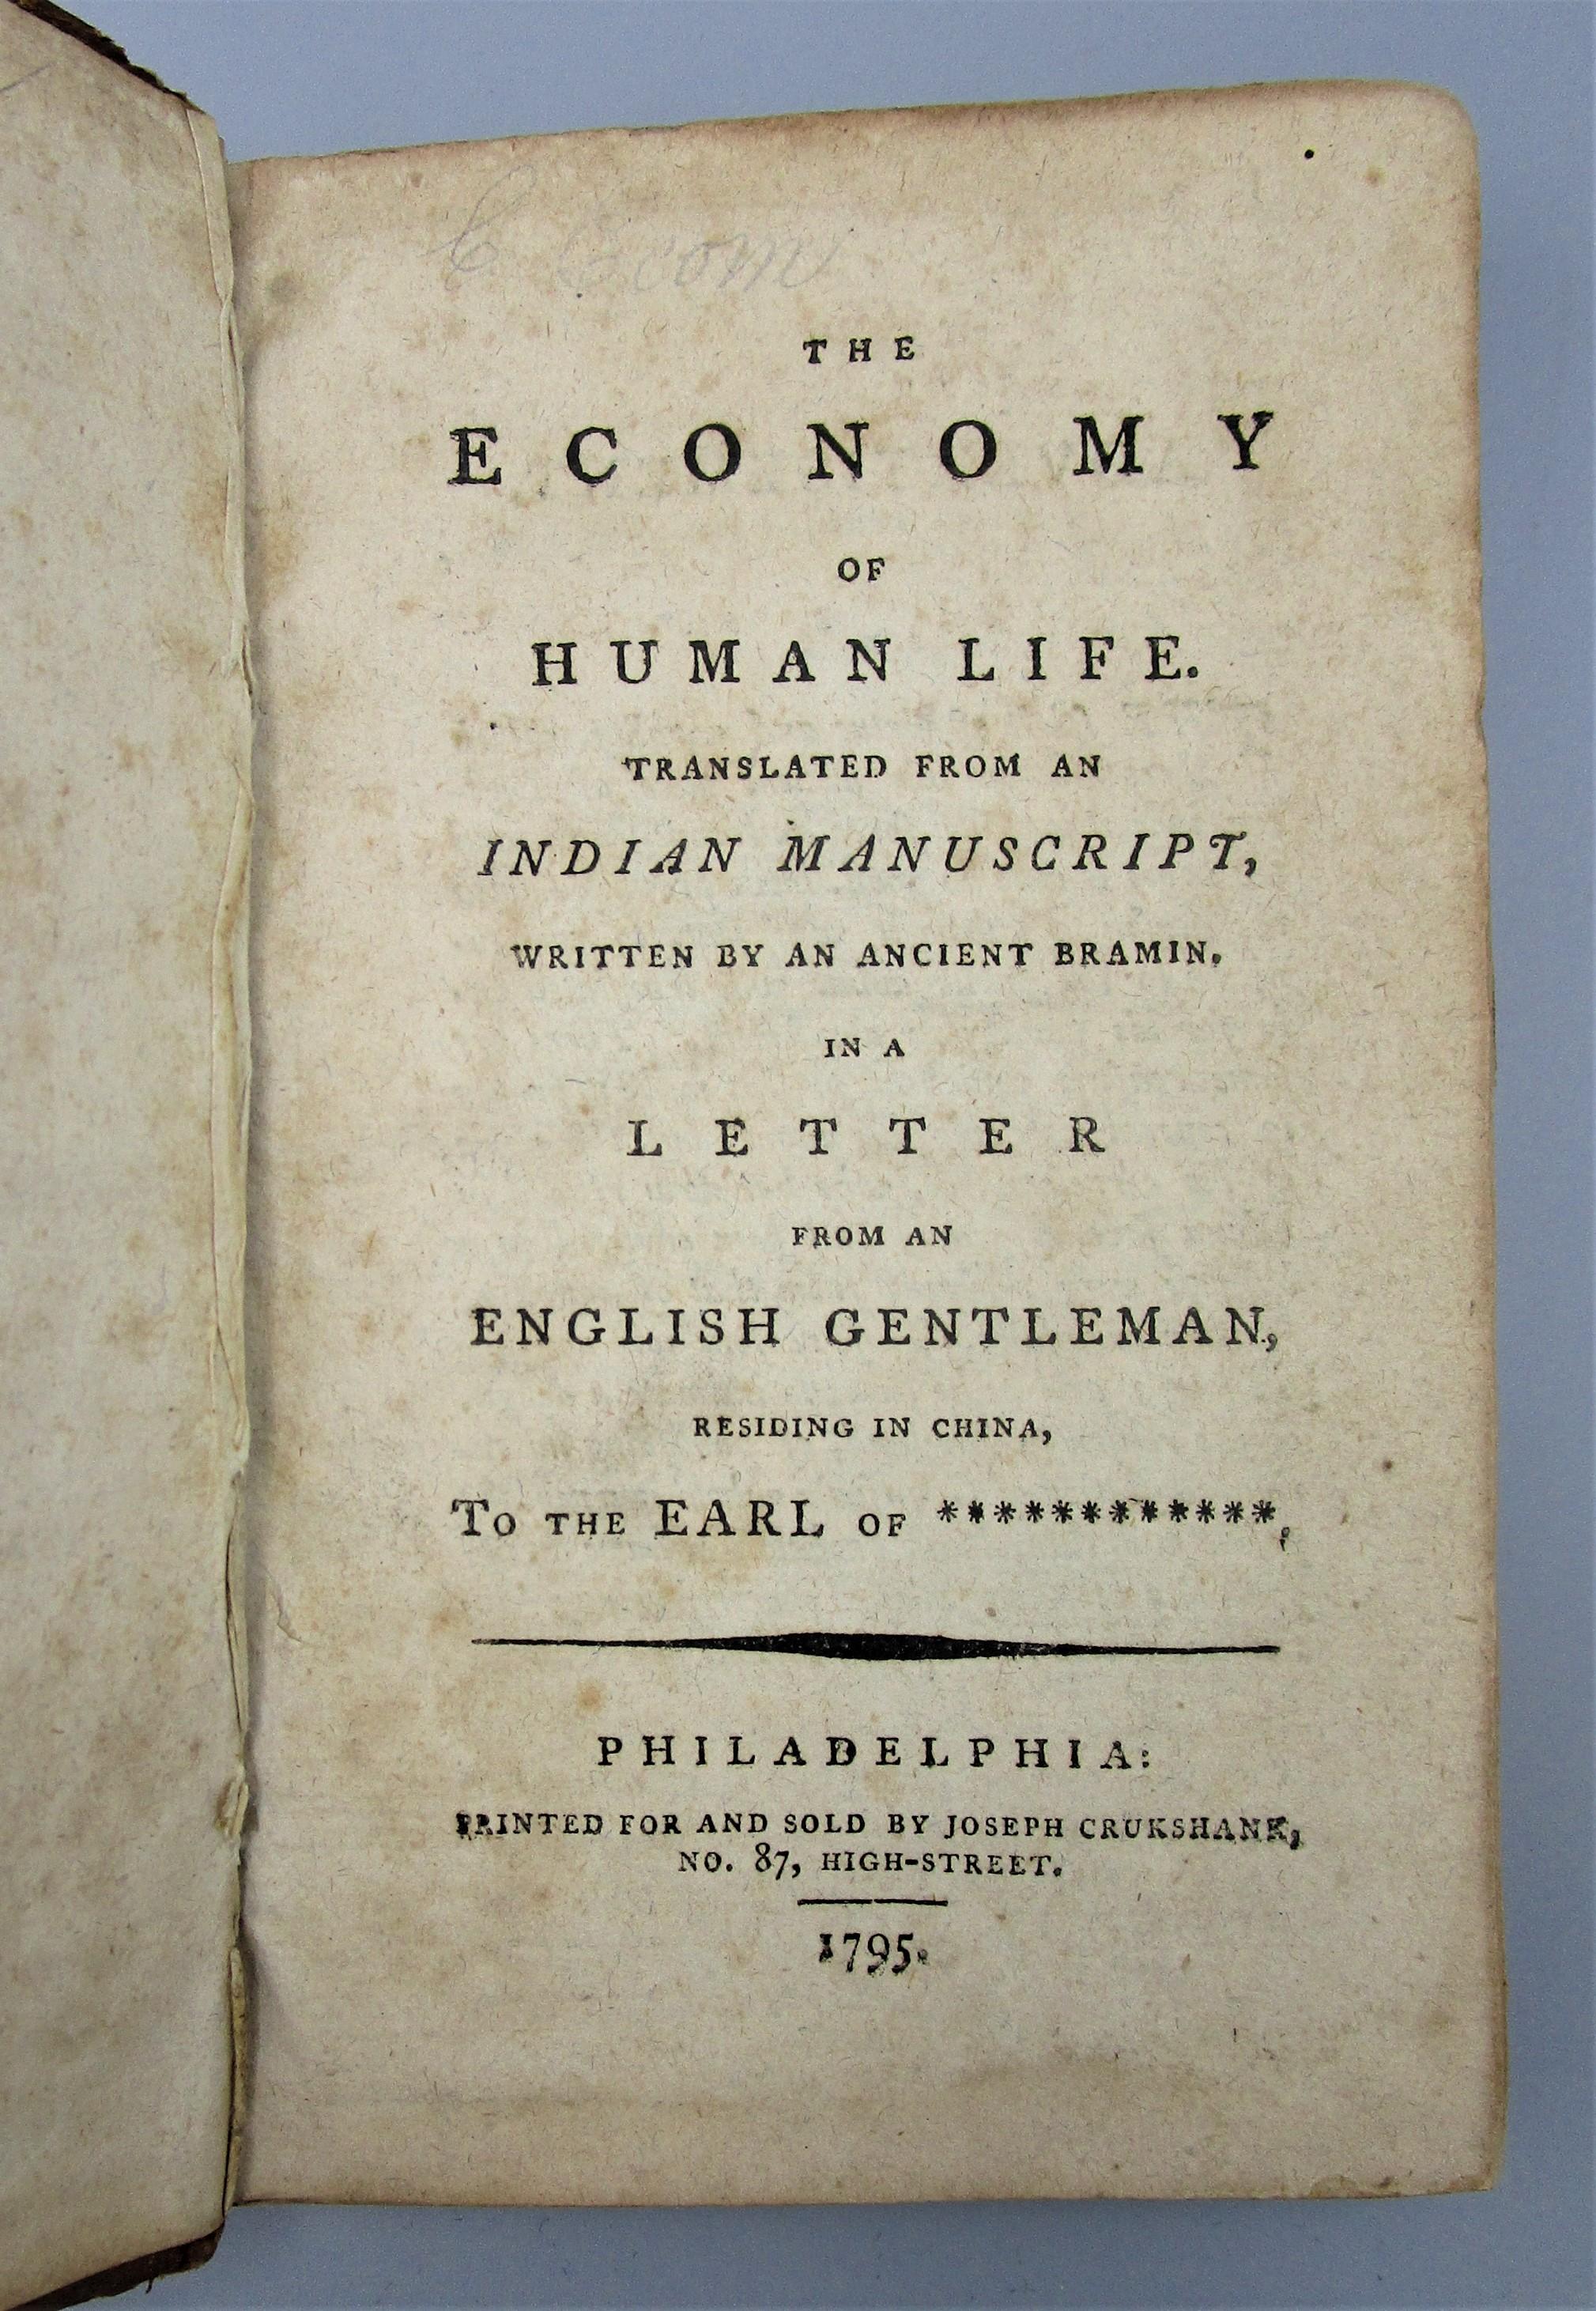 THE ECONOMY OF HUMAN LIFE, by Joseph Crukshank - 1795